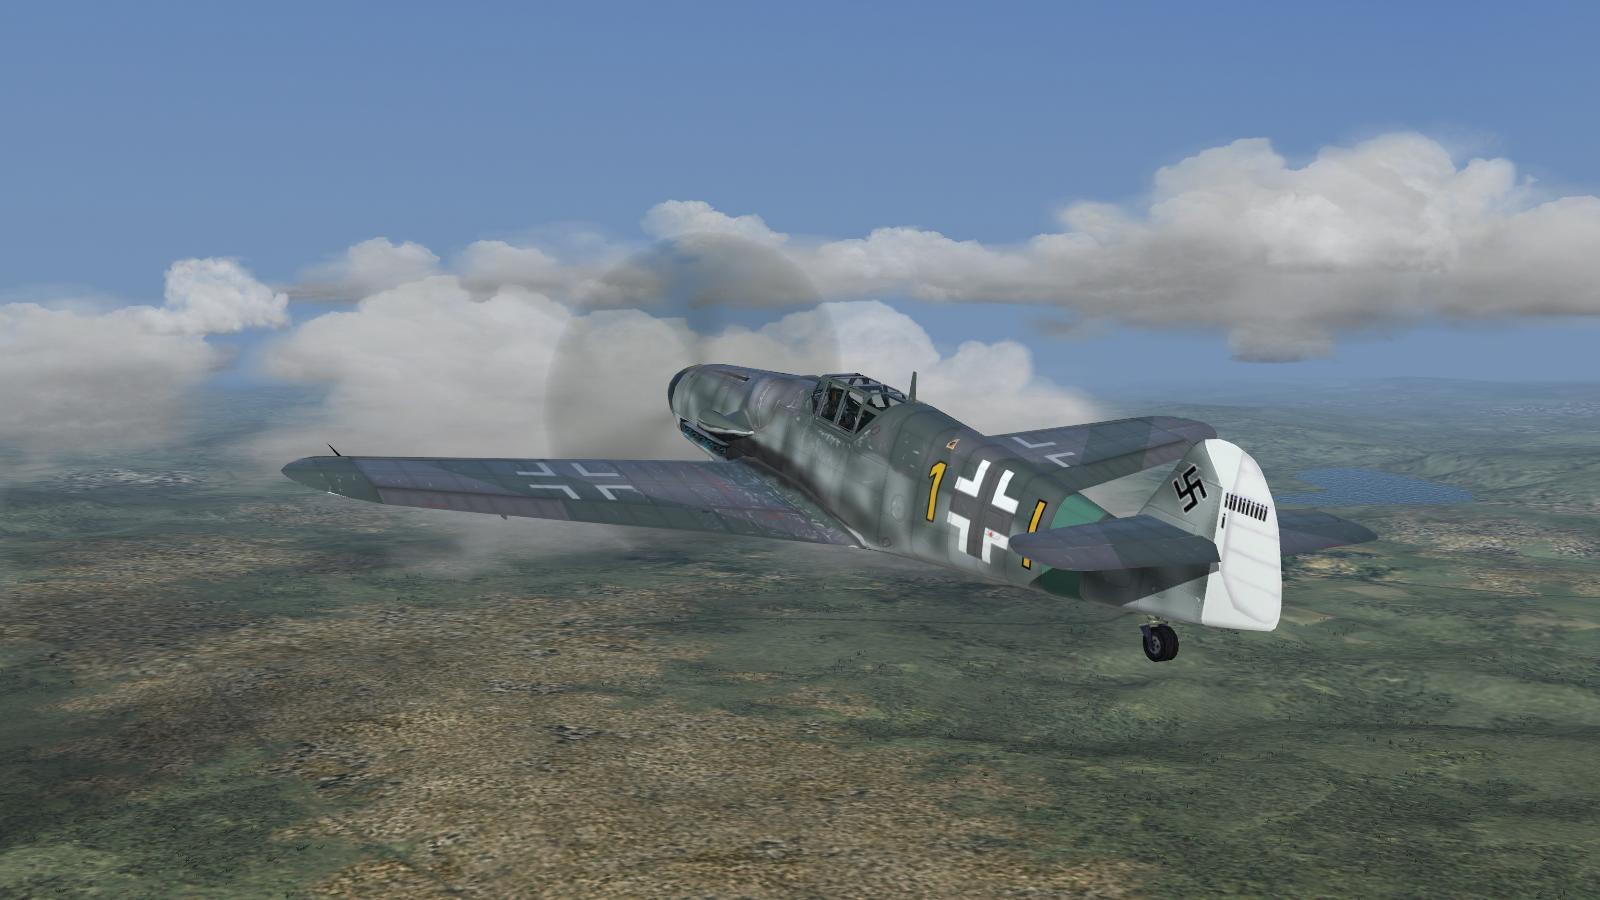 CFS3 + ETO Expansion + Ankor's DX9 mod - Bf 109G-6, III/JG27